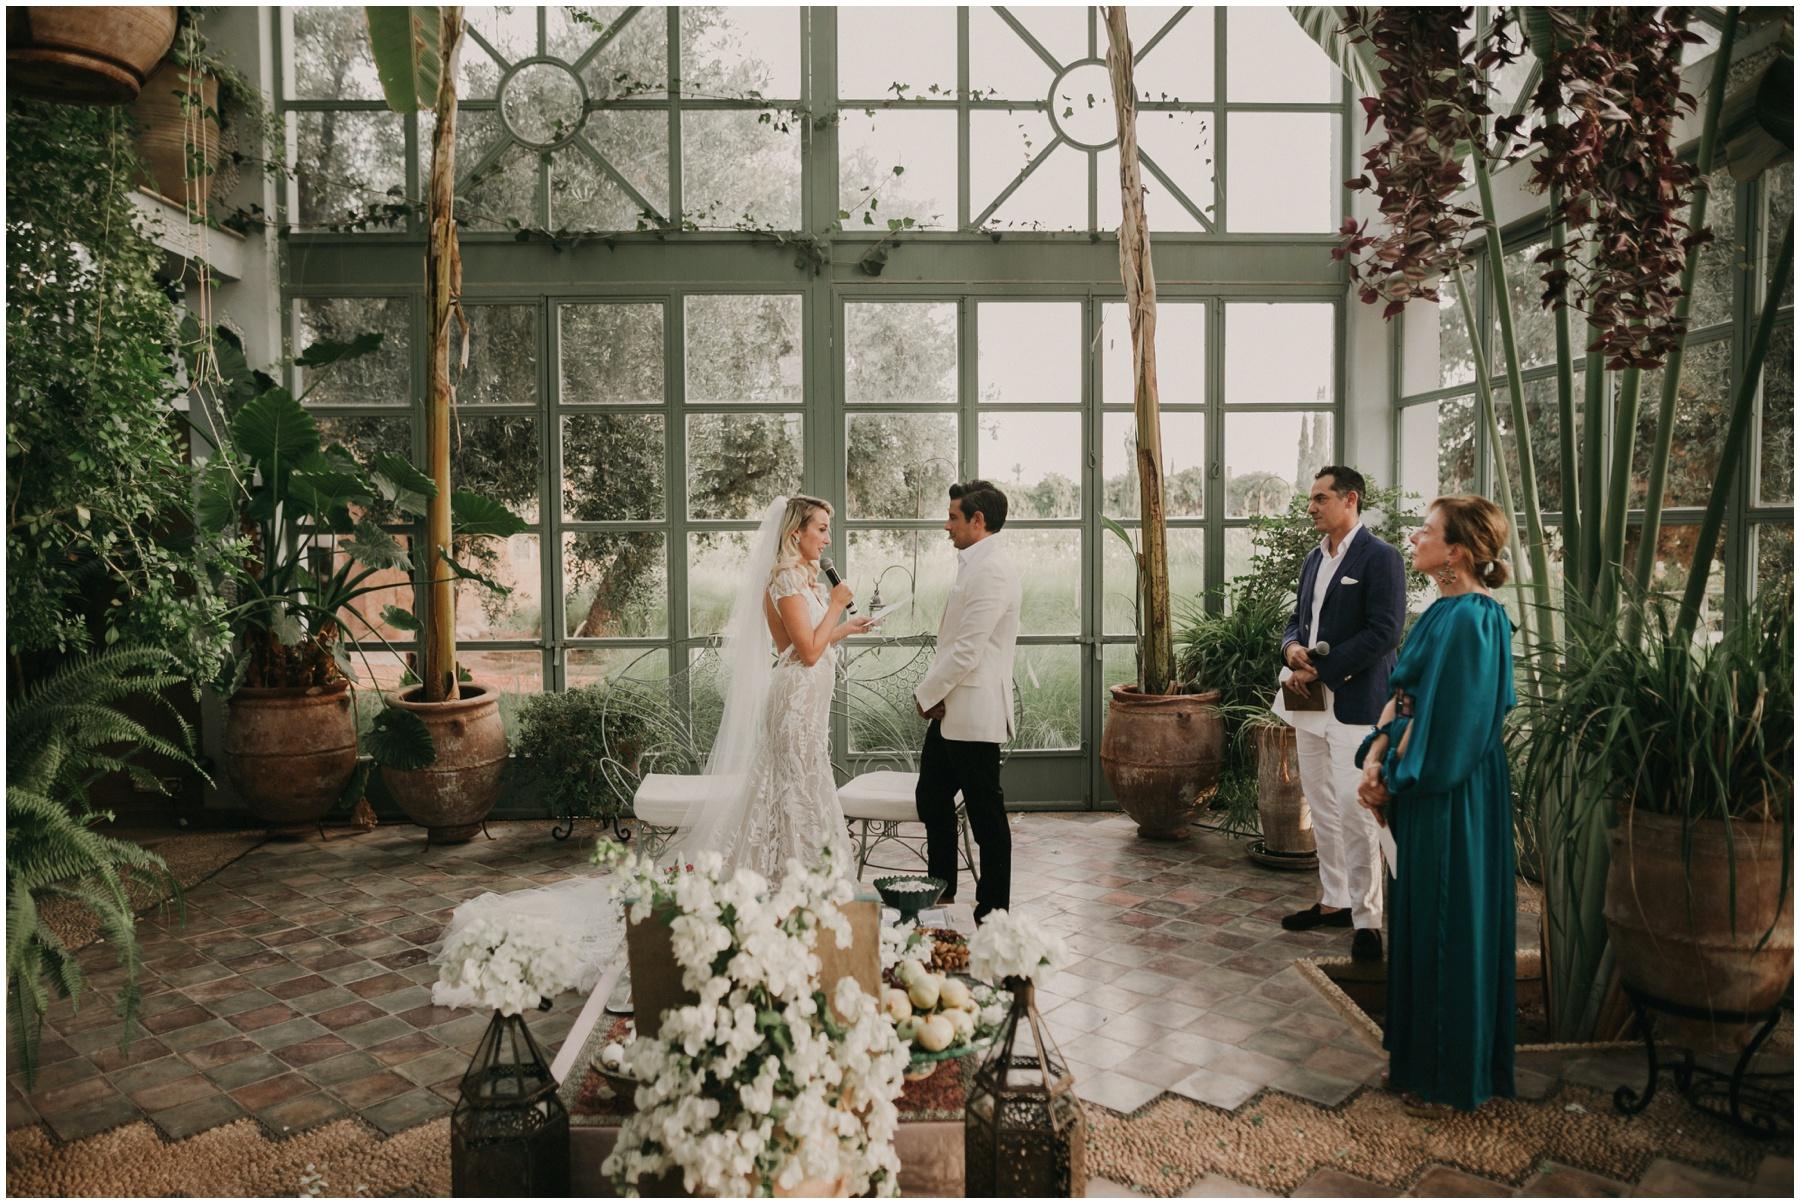 Marrakech Wedding Beldi Coutry Club 052.JPG